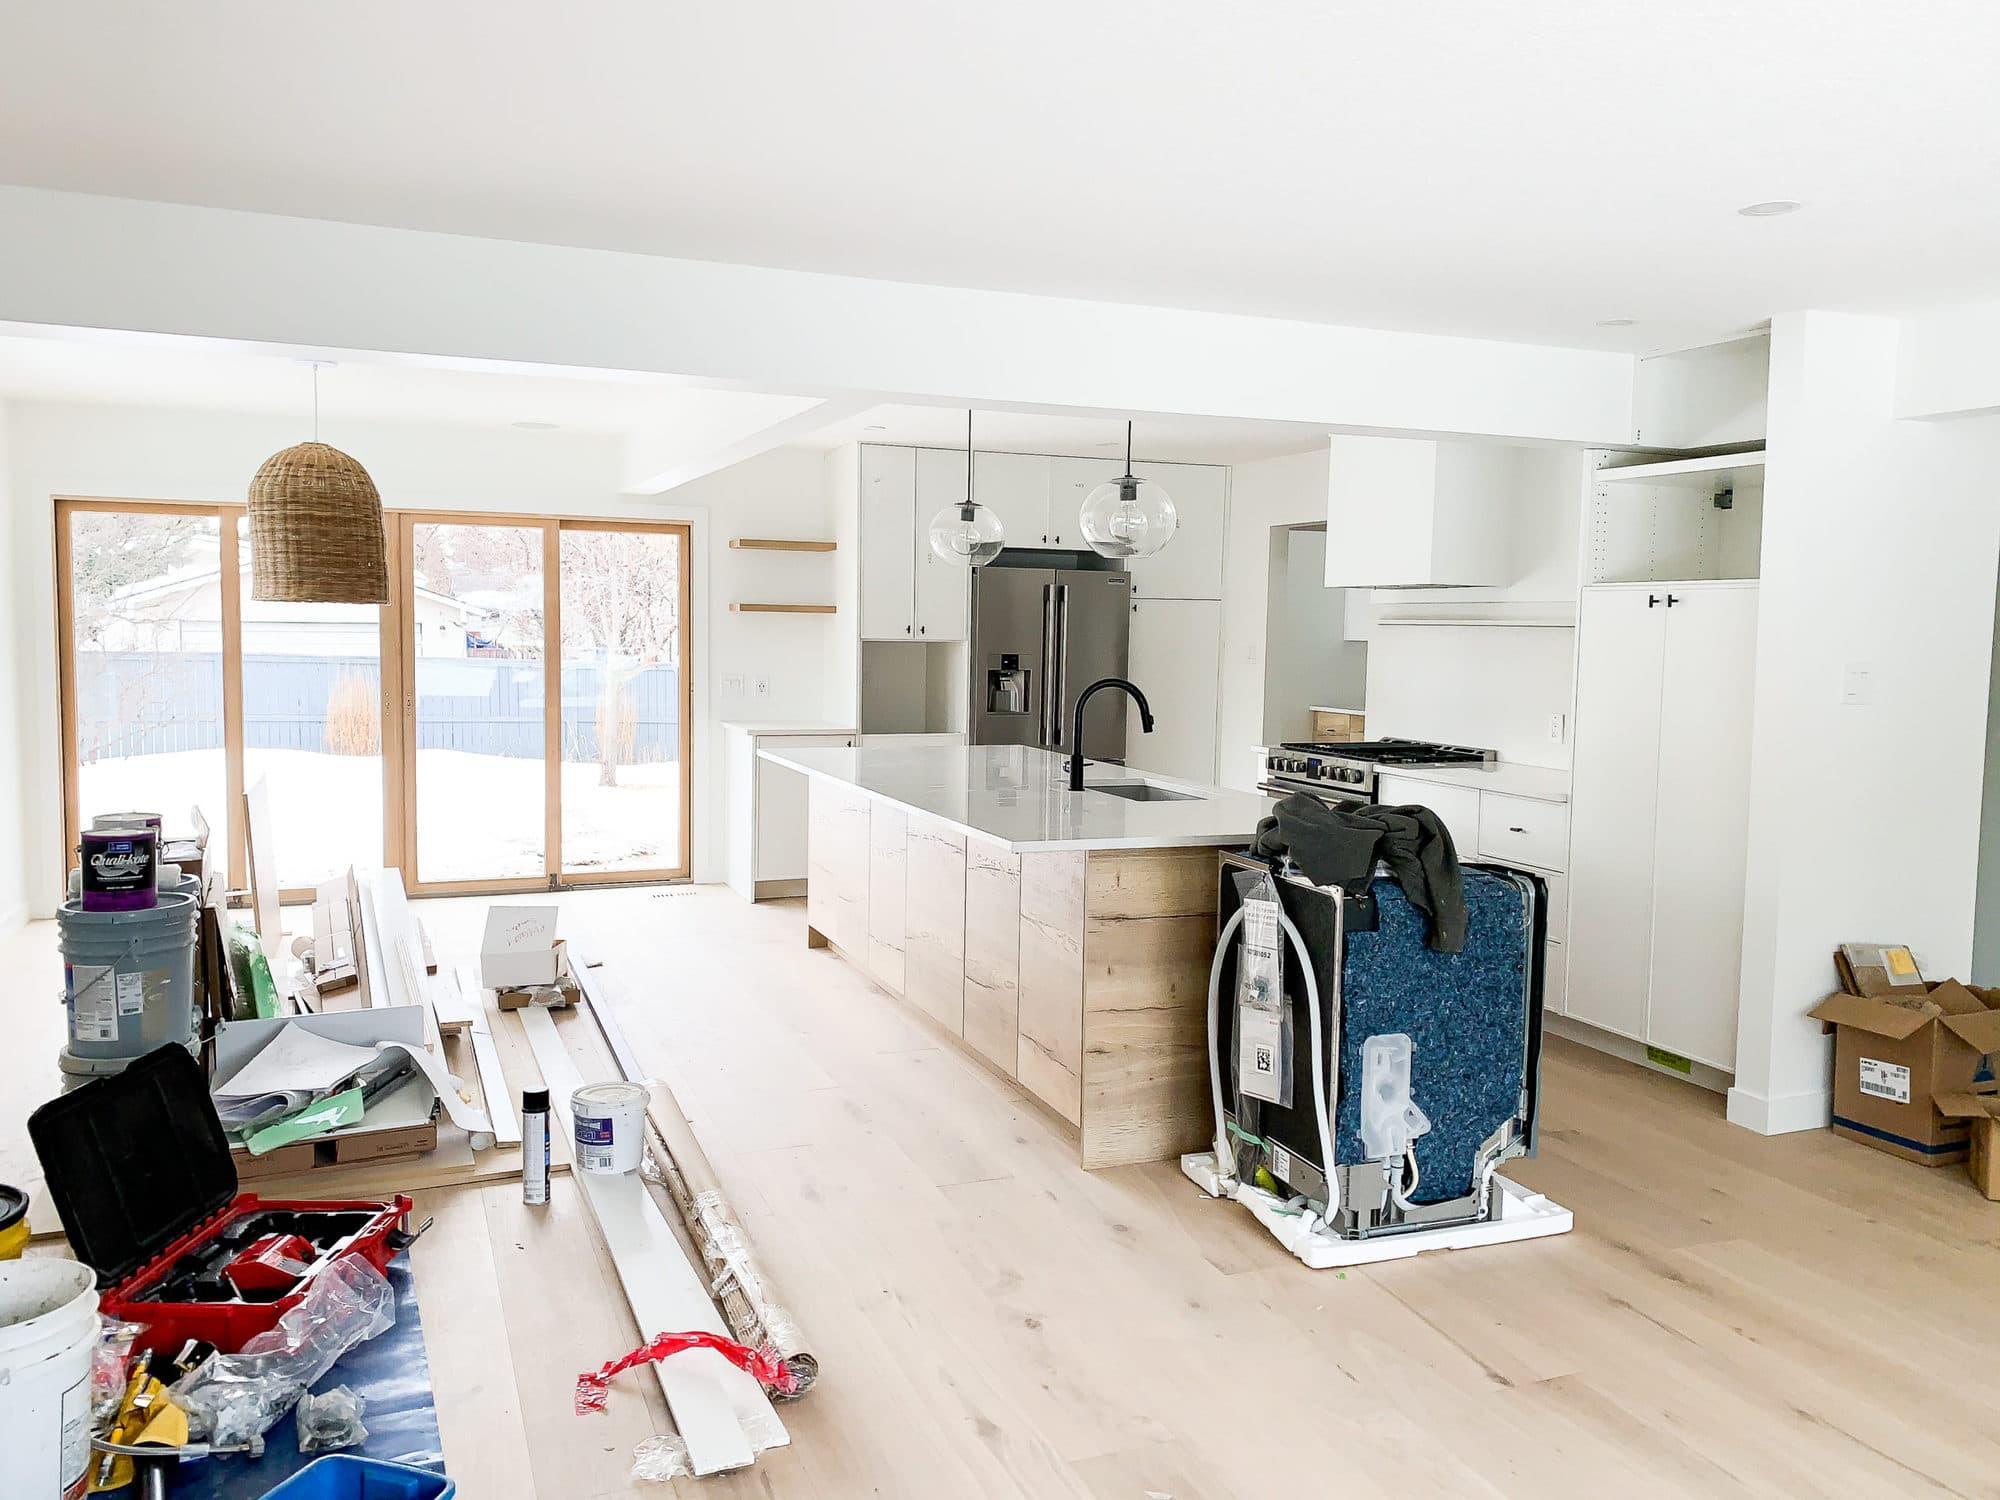 Full Home Renovation - Earthy Coastal Scandinavian California Minimal House Renovation/Remodel